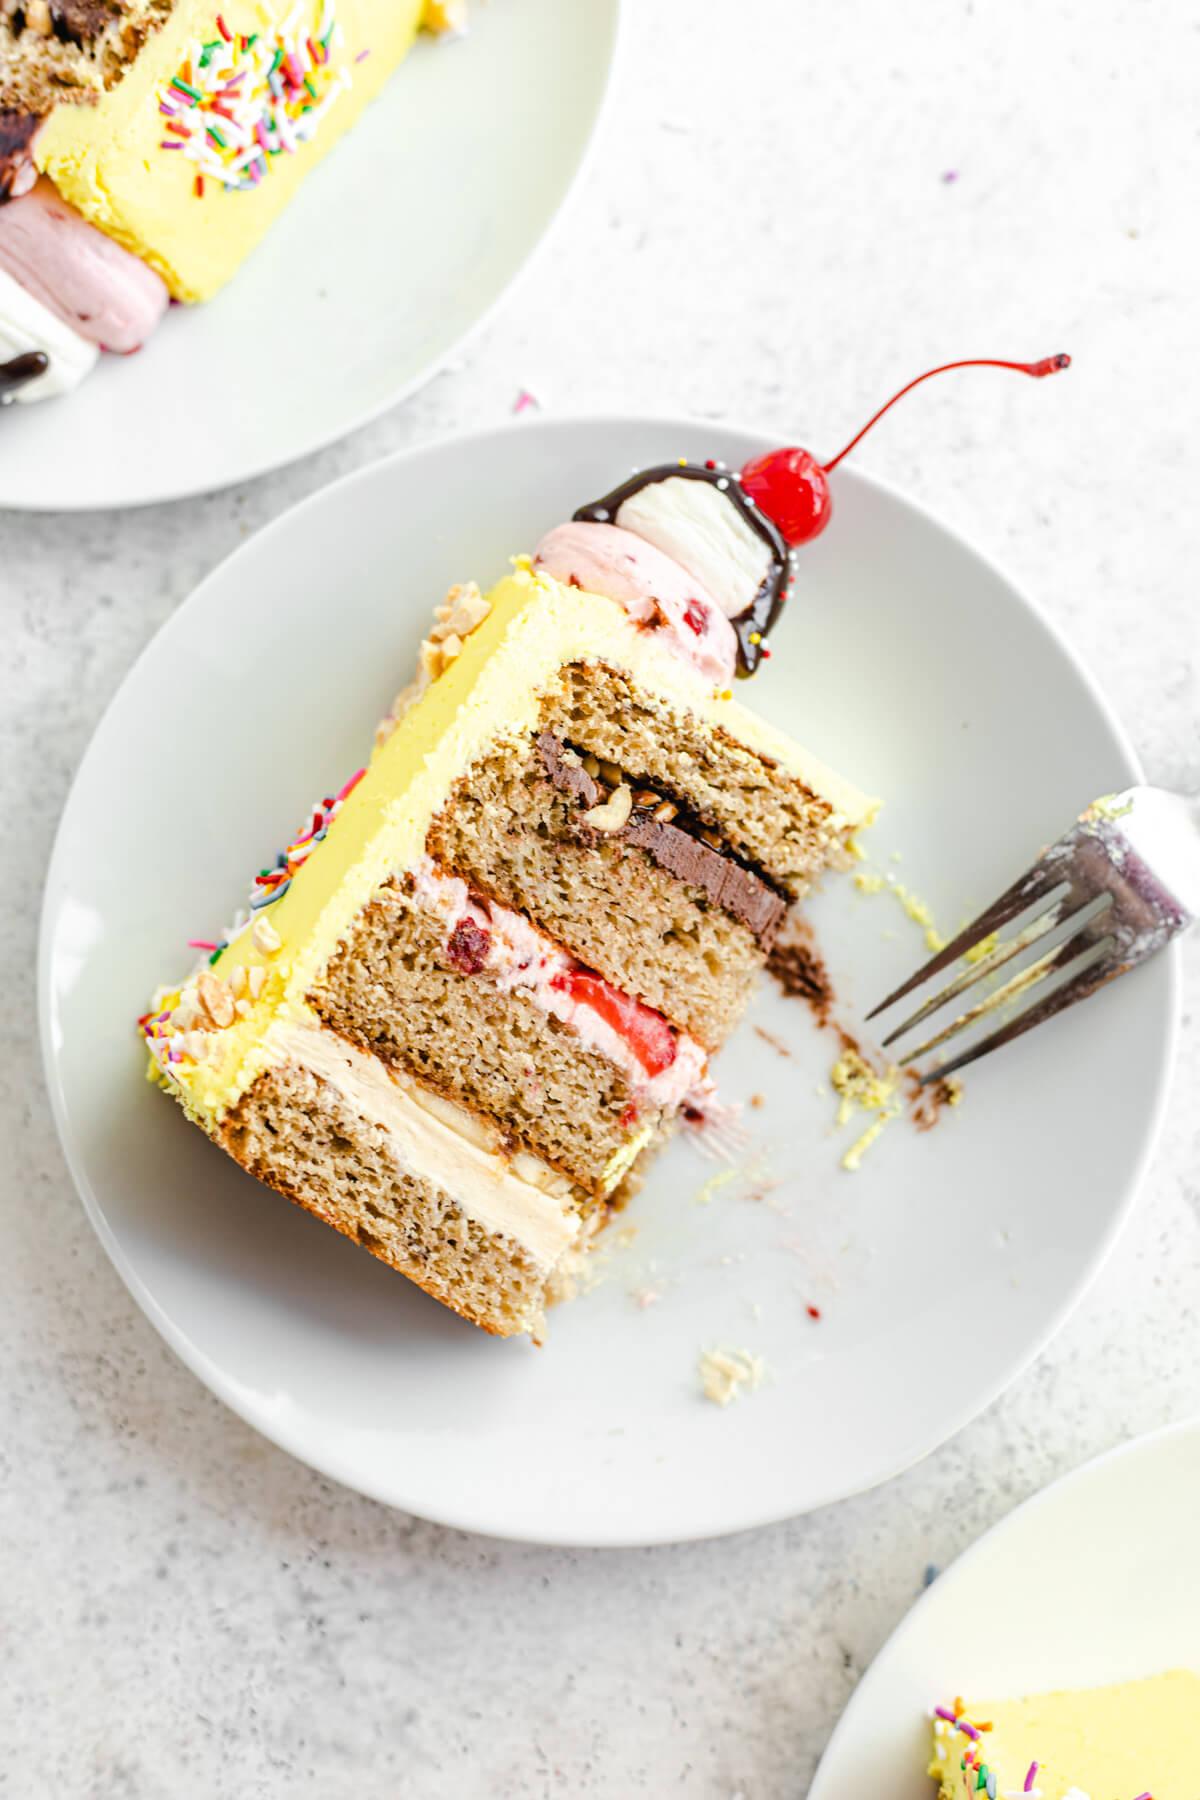 half eaten cake on a white plate